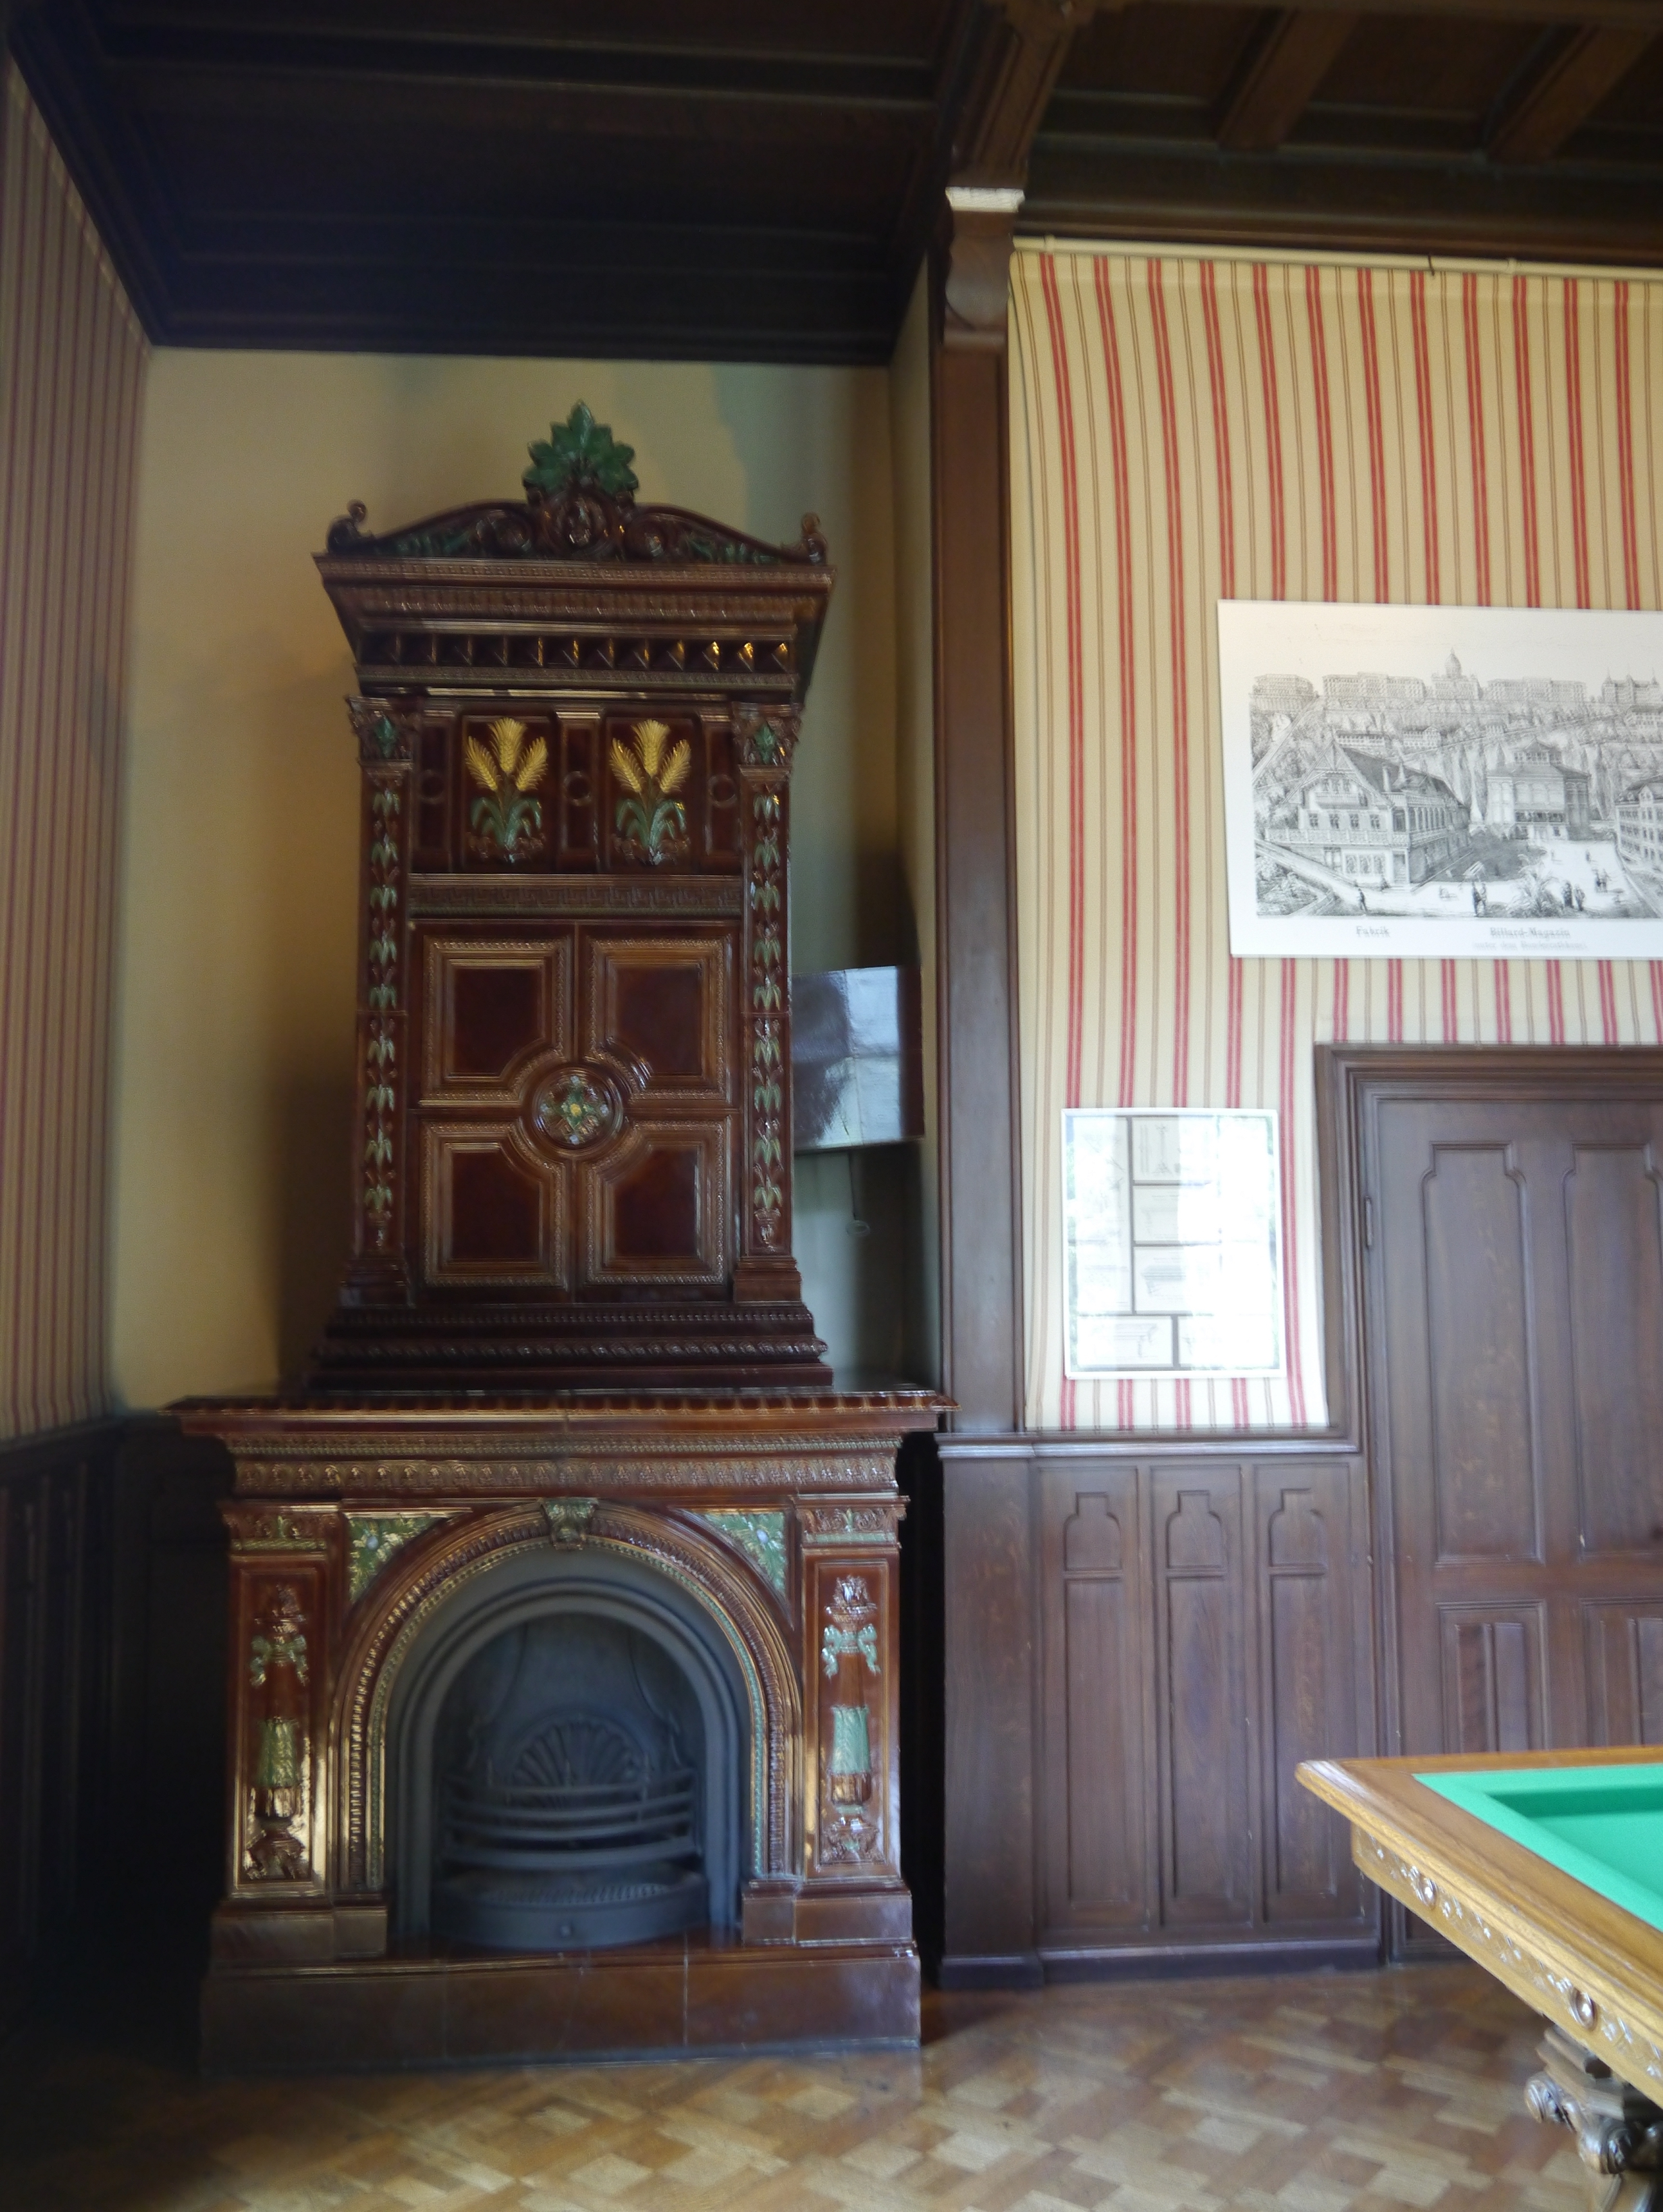 file oberhofen schloss oberhofen innen billardzimmer 4 jpg wikimedia commons. Black Bedroom Furniture Sets. Home Design Ideas